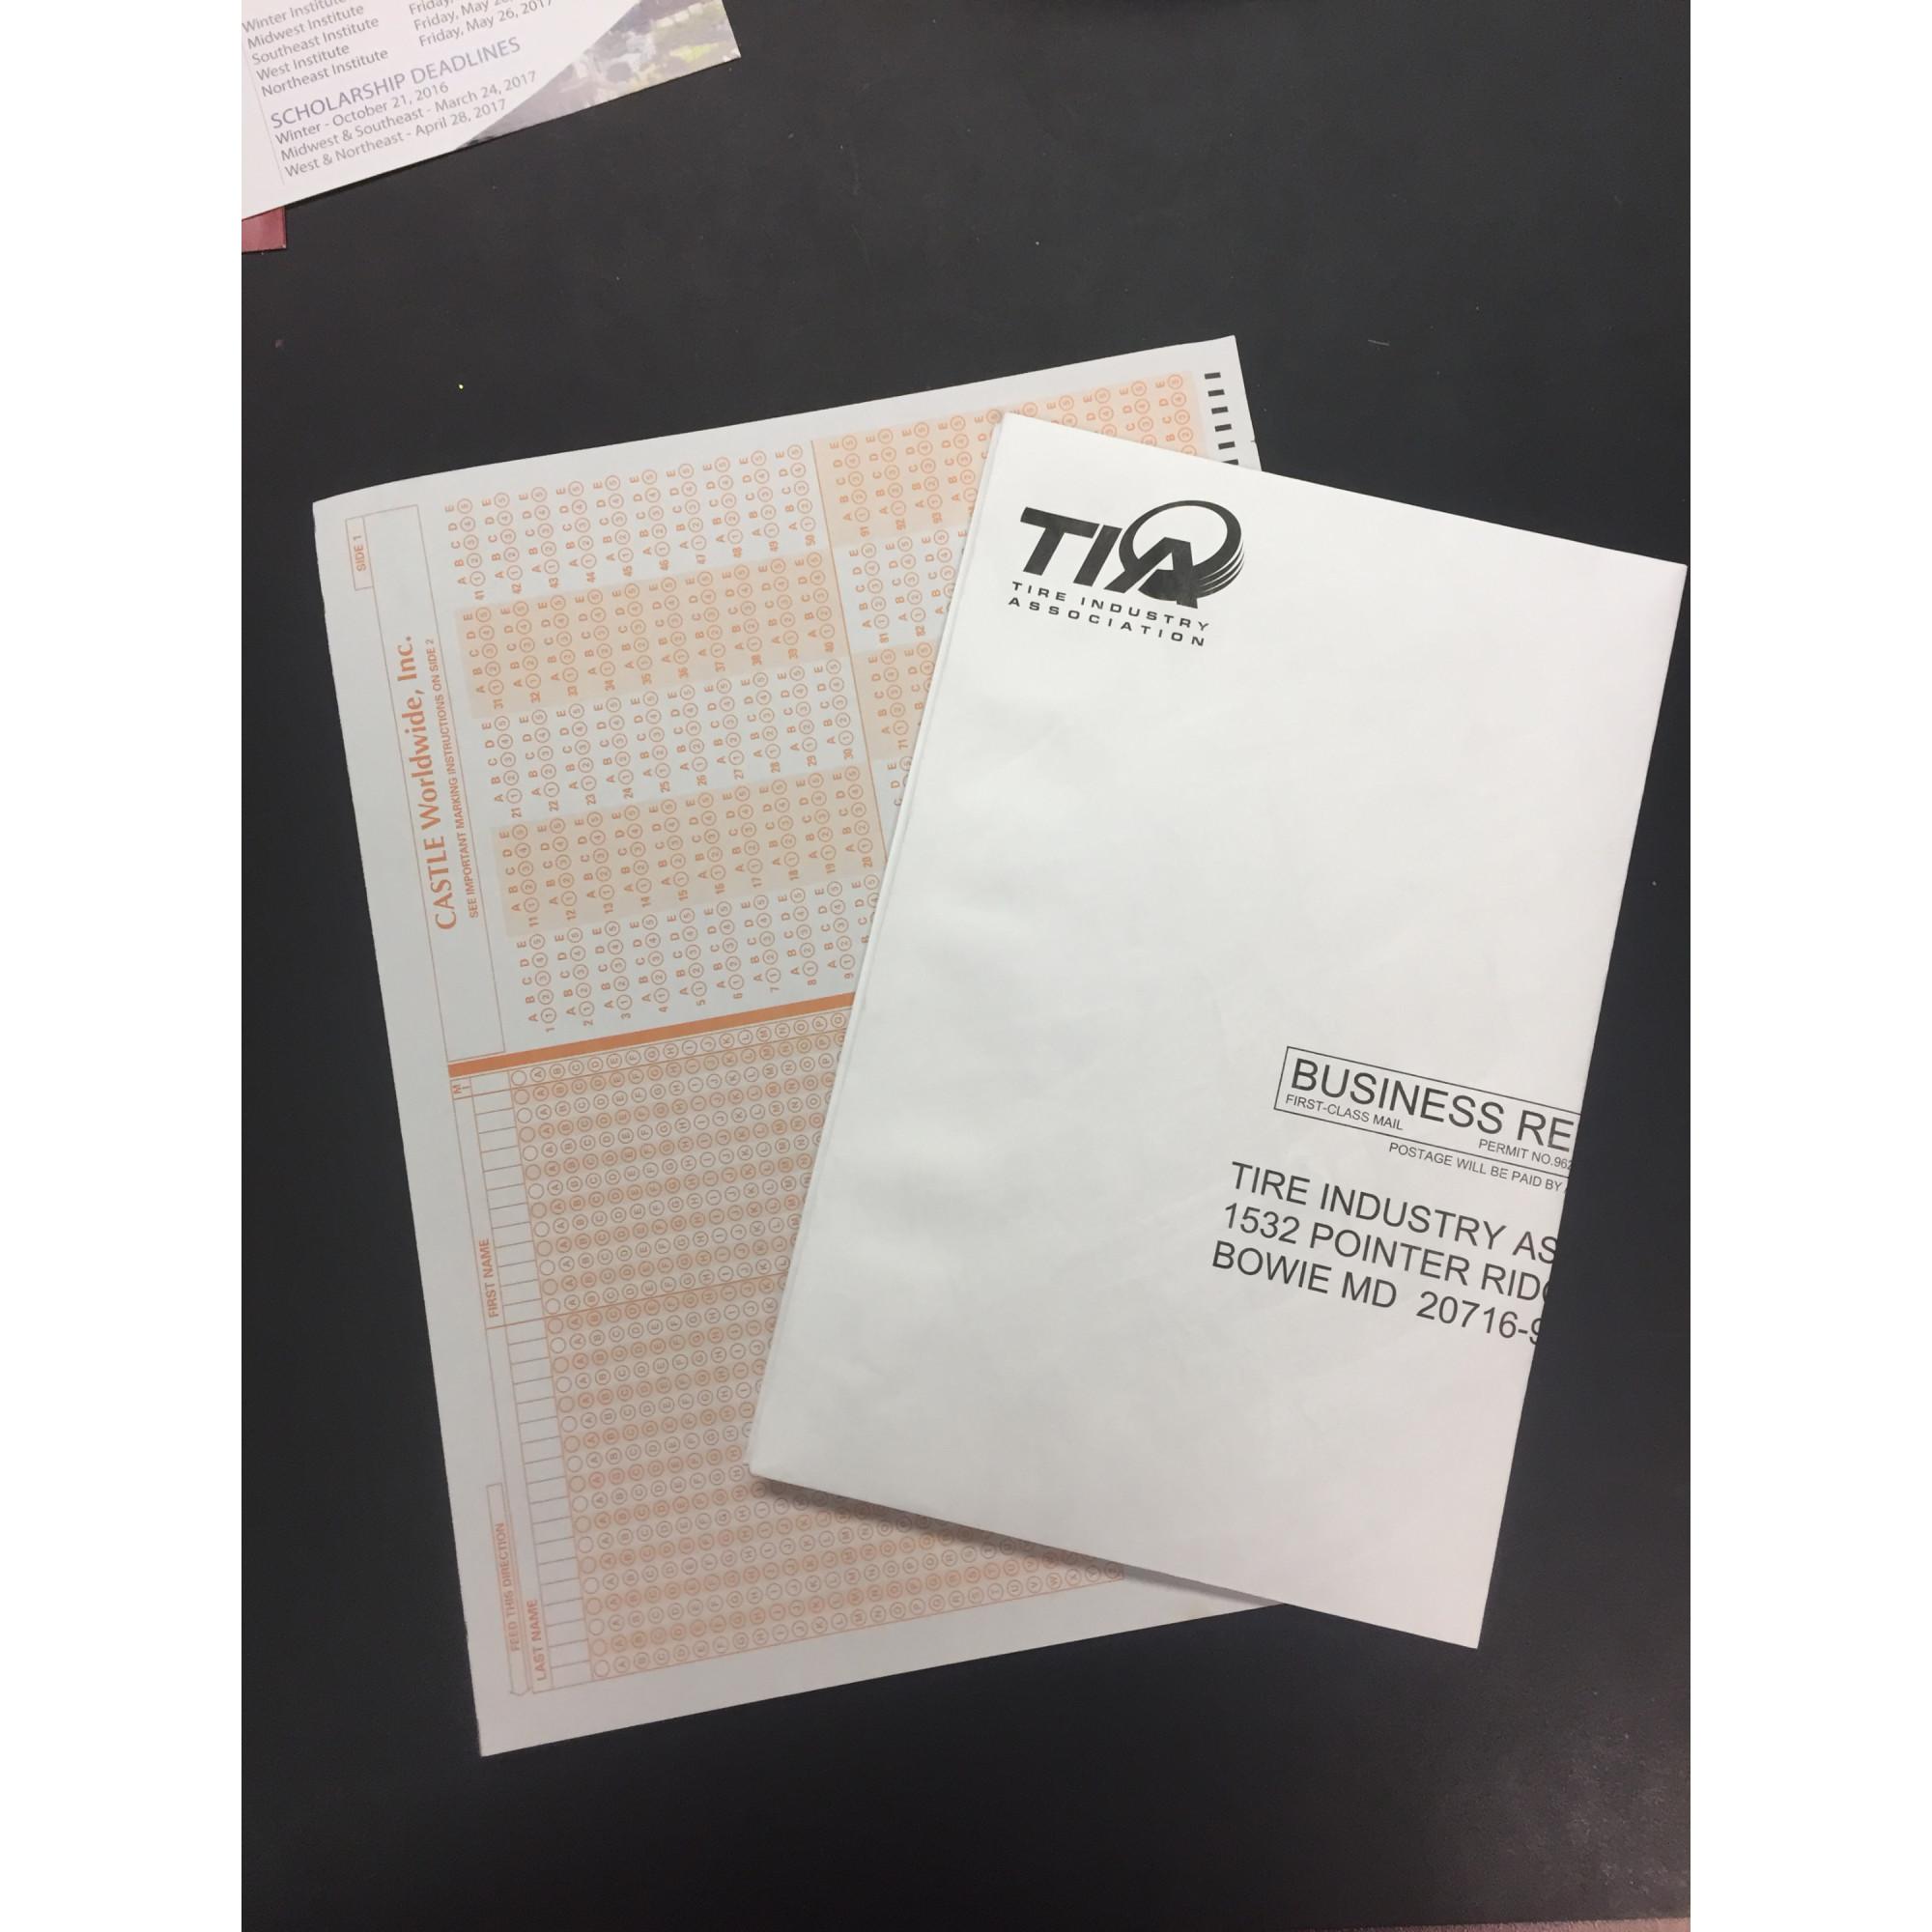 Score sheet; Return envelope